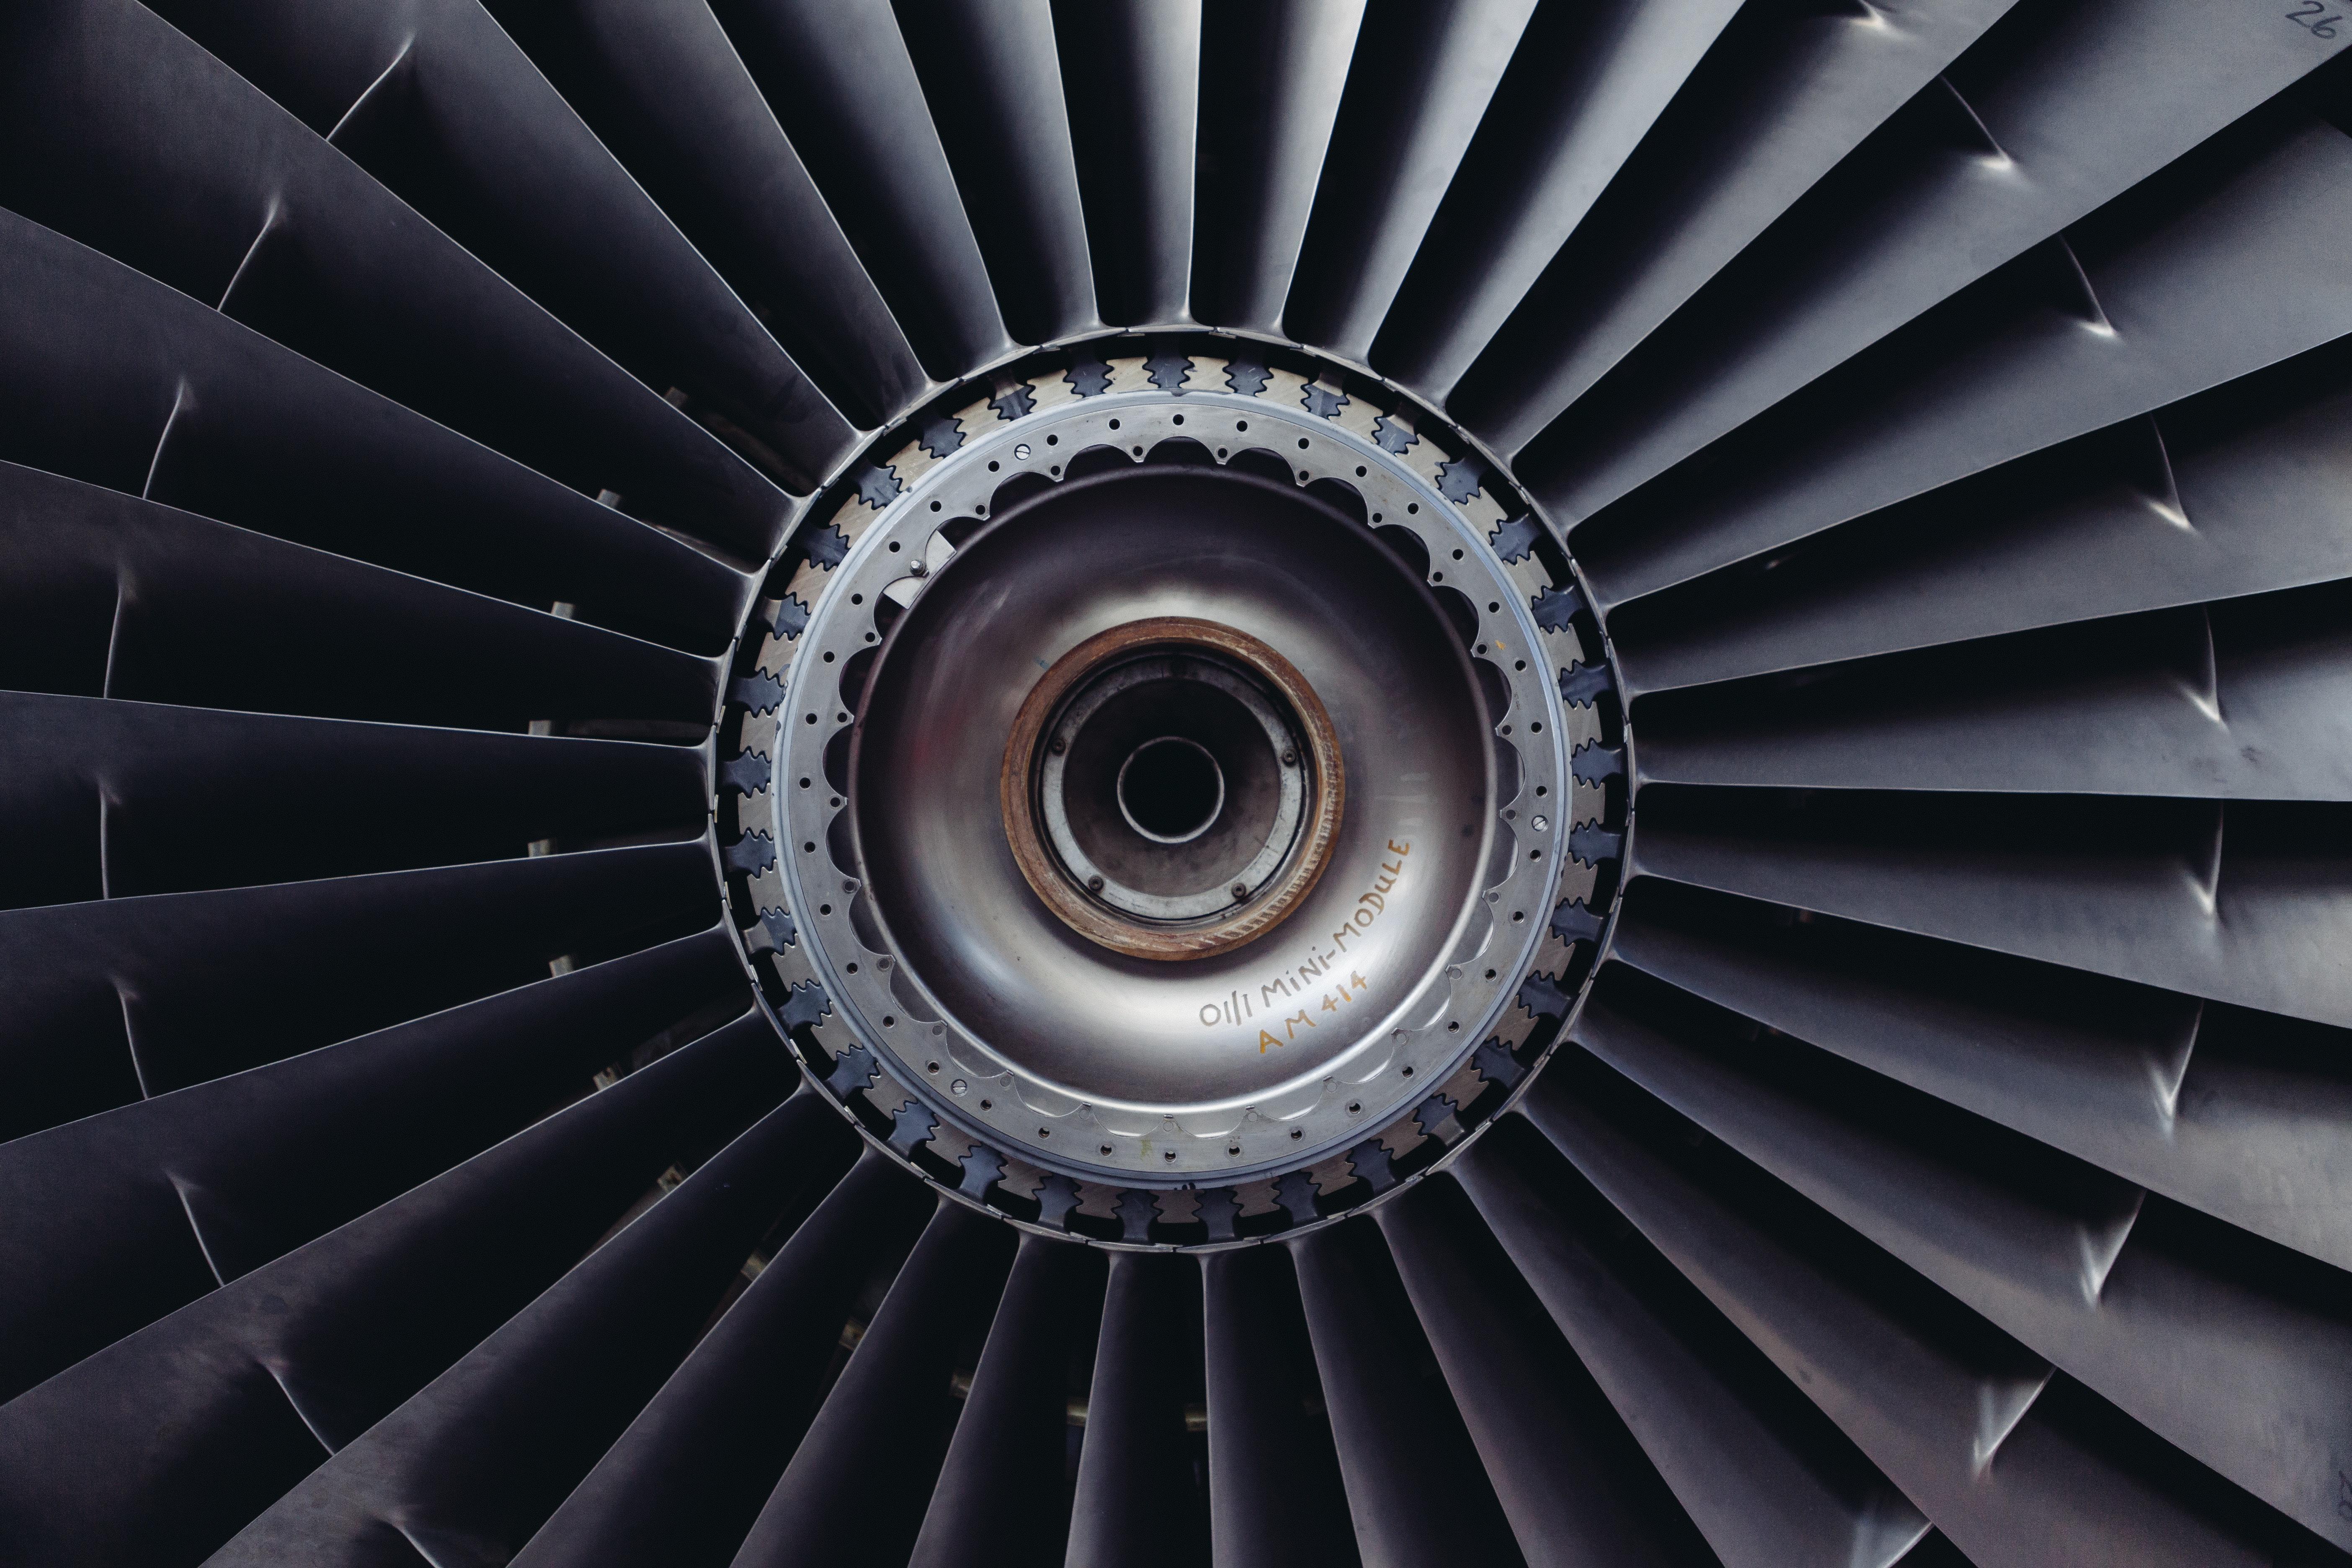 Level 3 Aircraft Maintenance Engineering